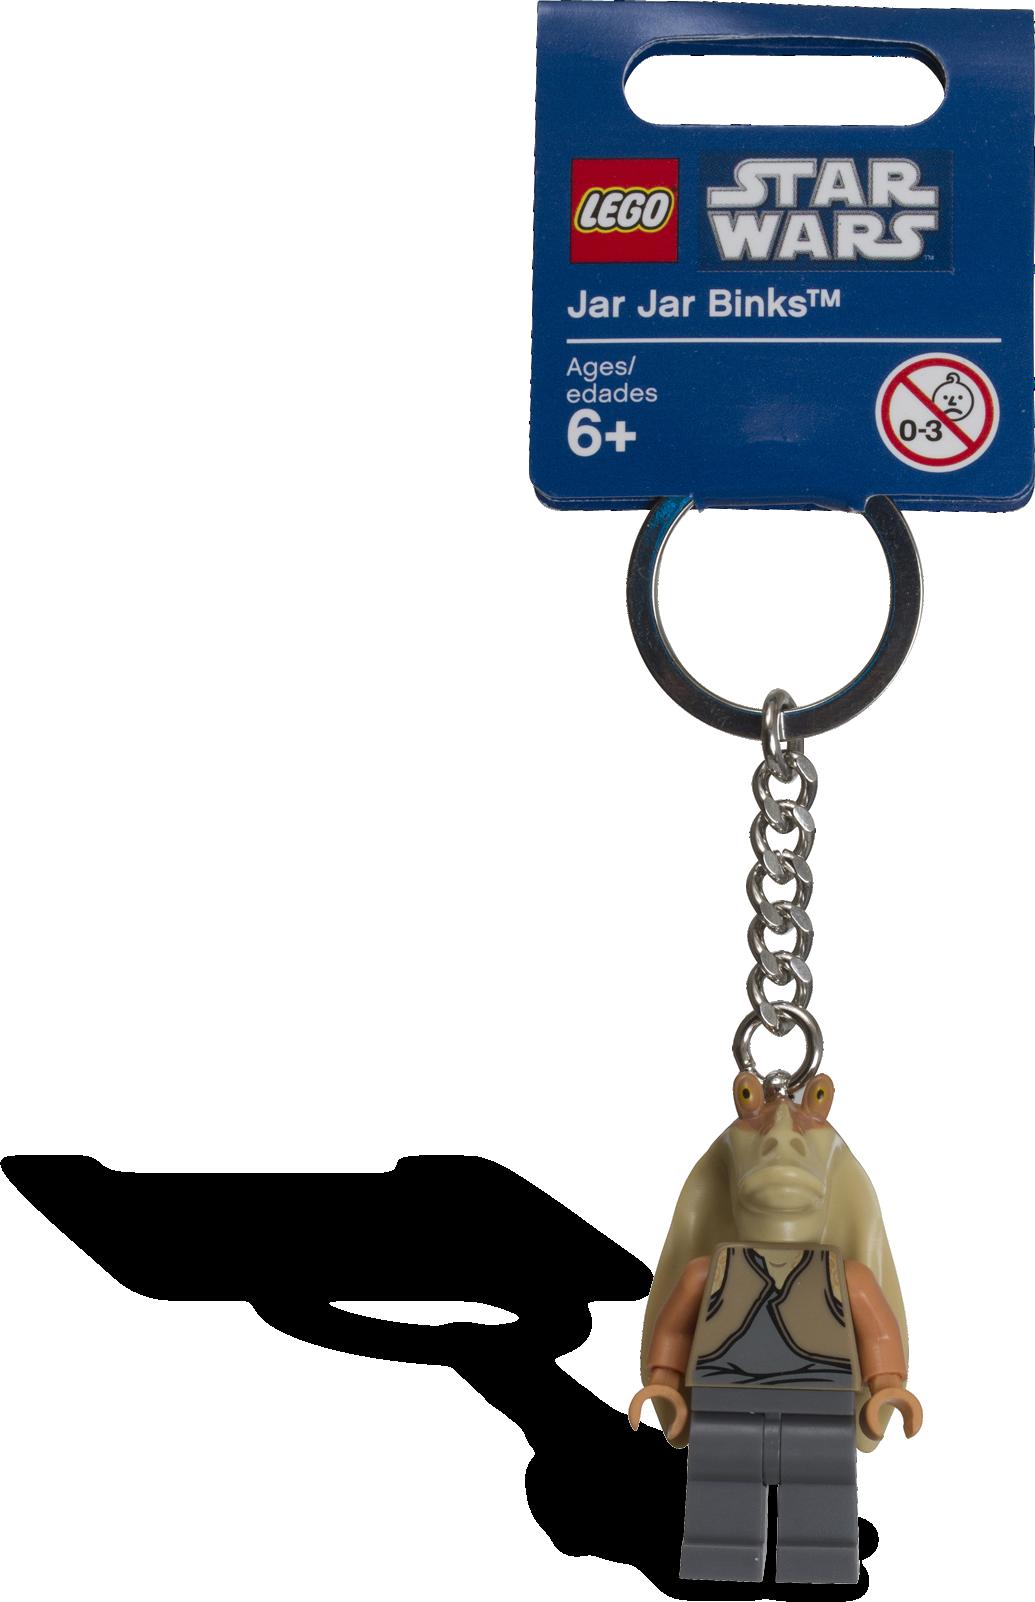 Jar Jar Binks